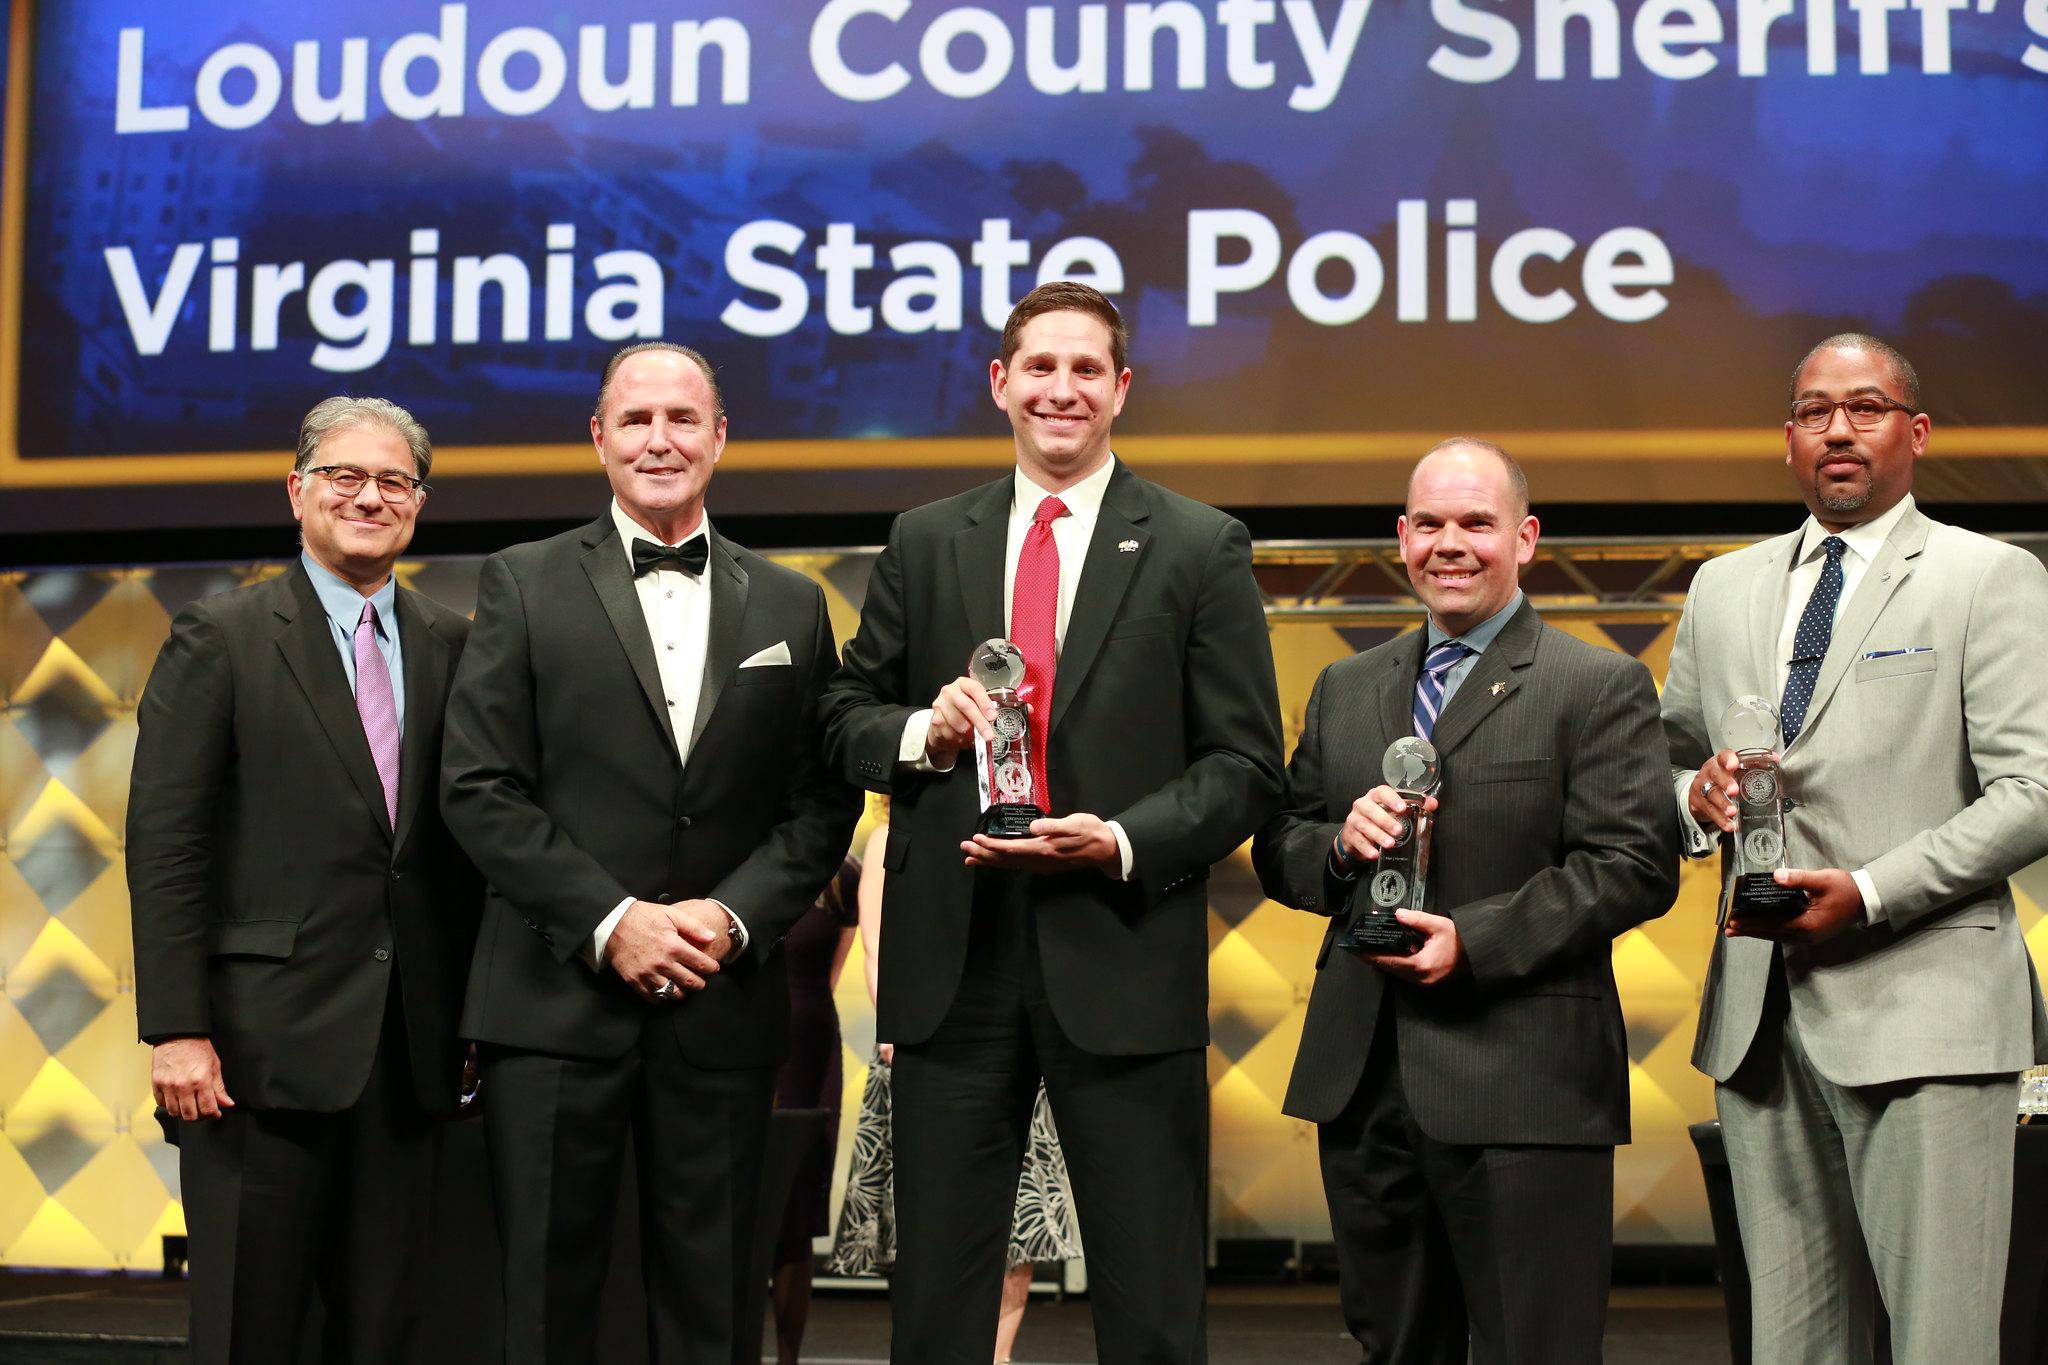 IACP Booze Allen Hamilton Leadership in the Prevention of Terrorism Award - VSP, LC, FBI